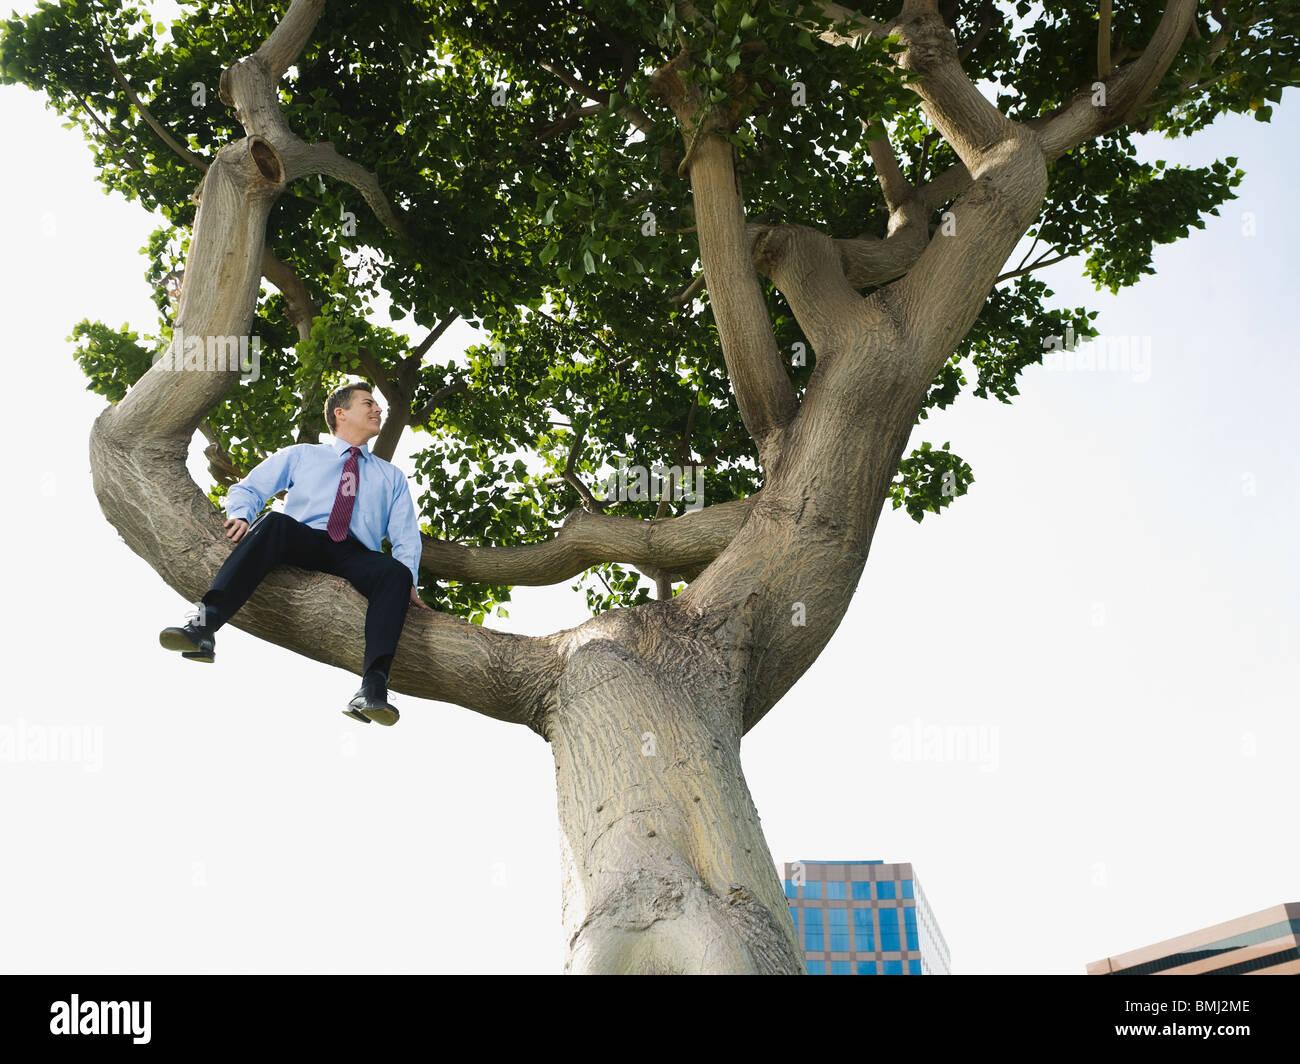 Businessman sitting in tree - Stock Image